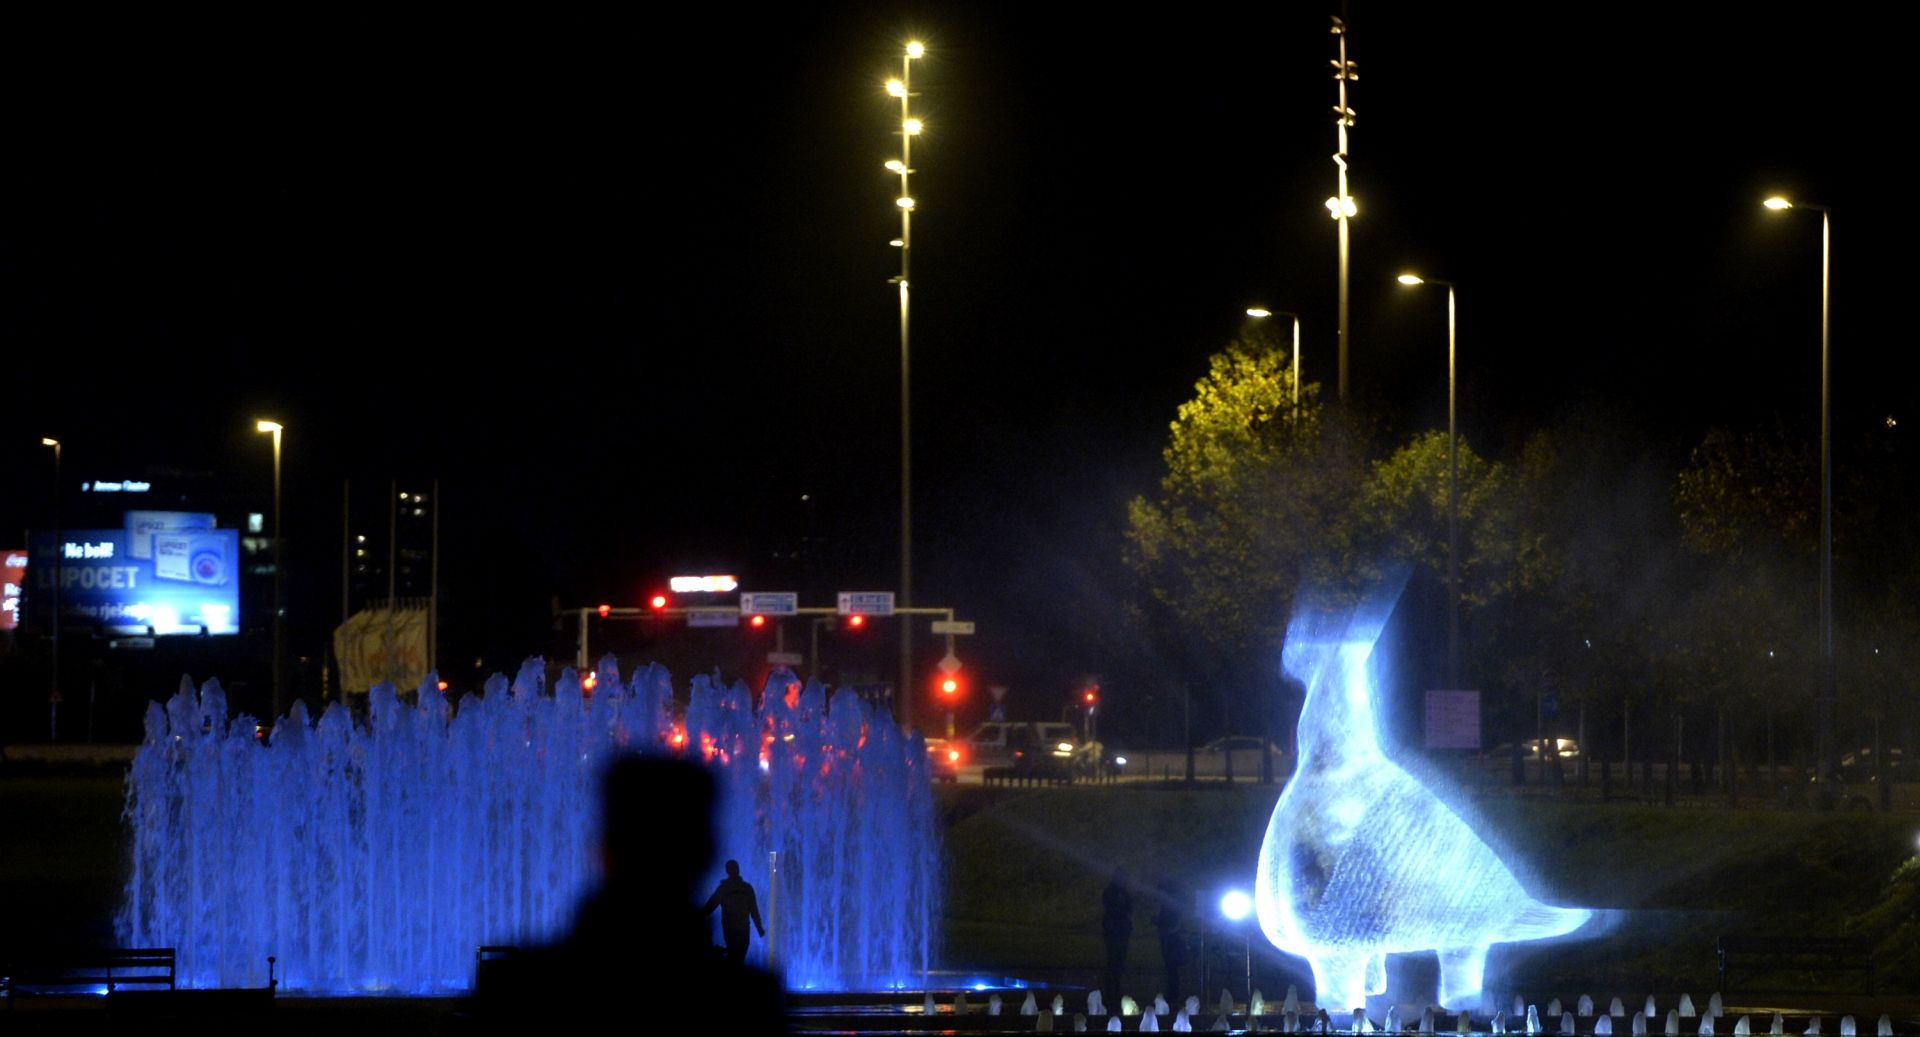 FOTO: Zagrebačke fontane zasjale u obliku Vučedolske golubice